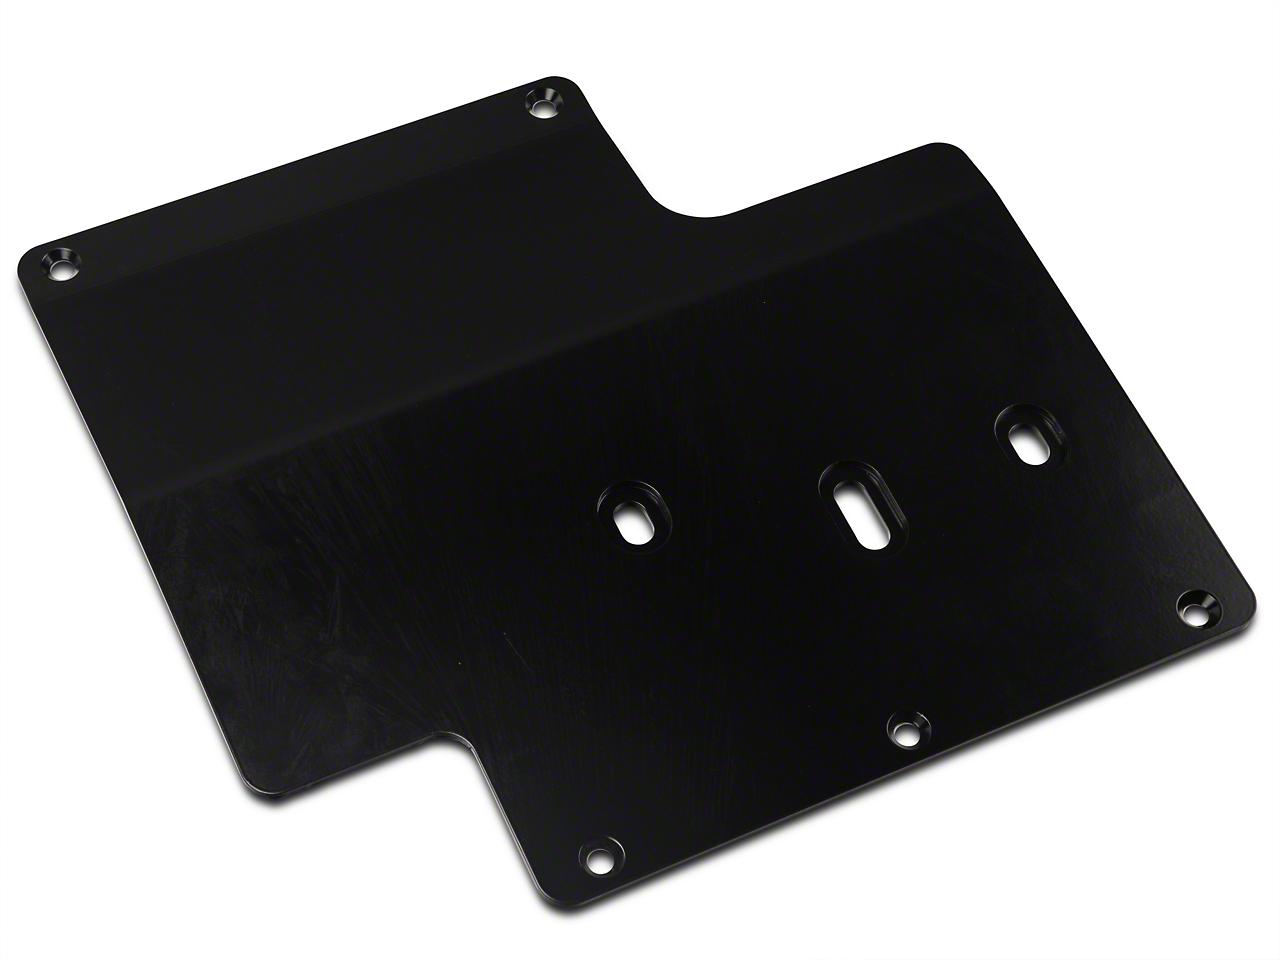 Synergy Standard Transmission Skid Plate - Black Powder Coated (07-18 Wrangler JK)